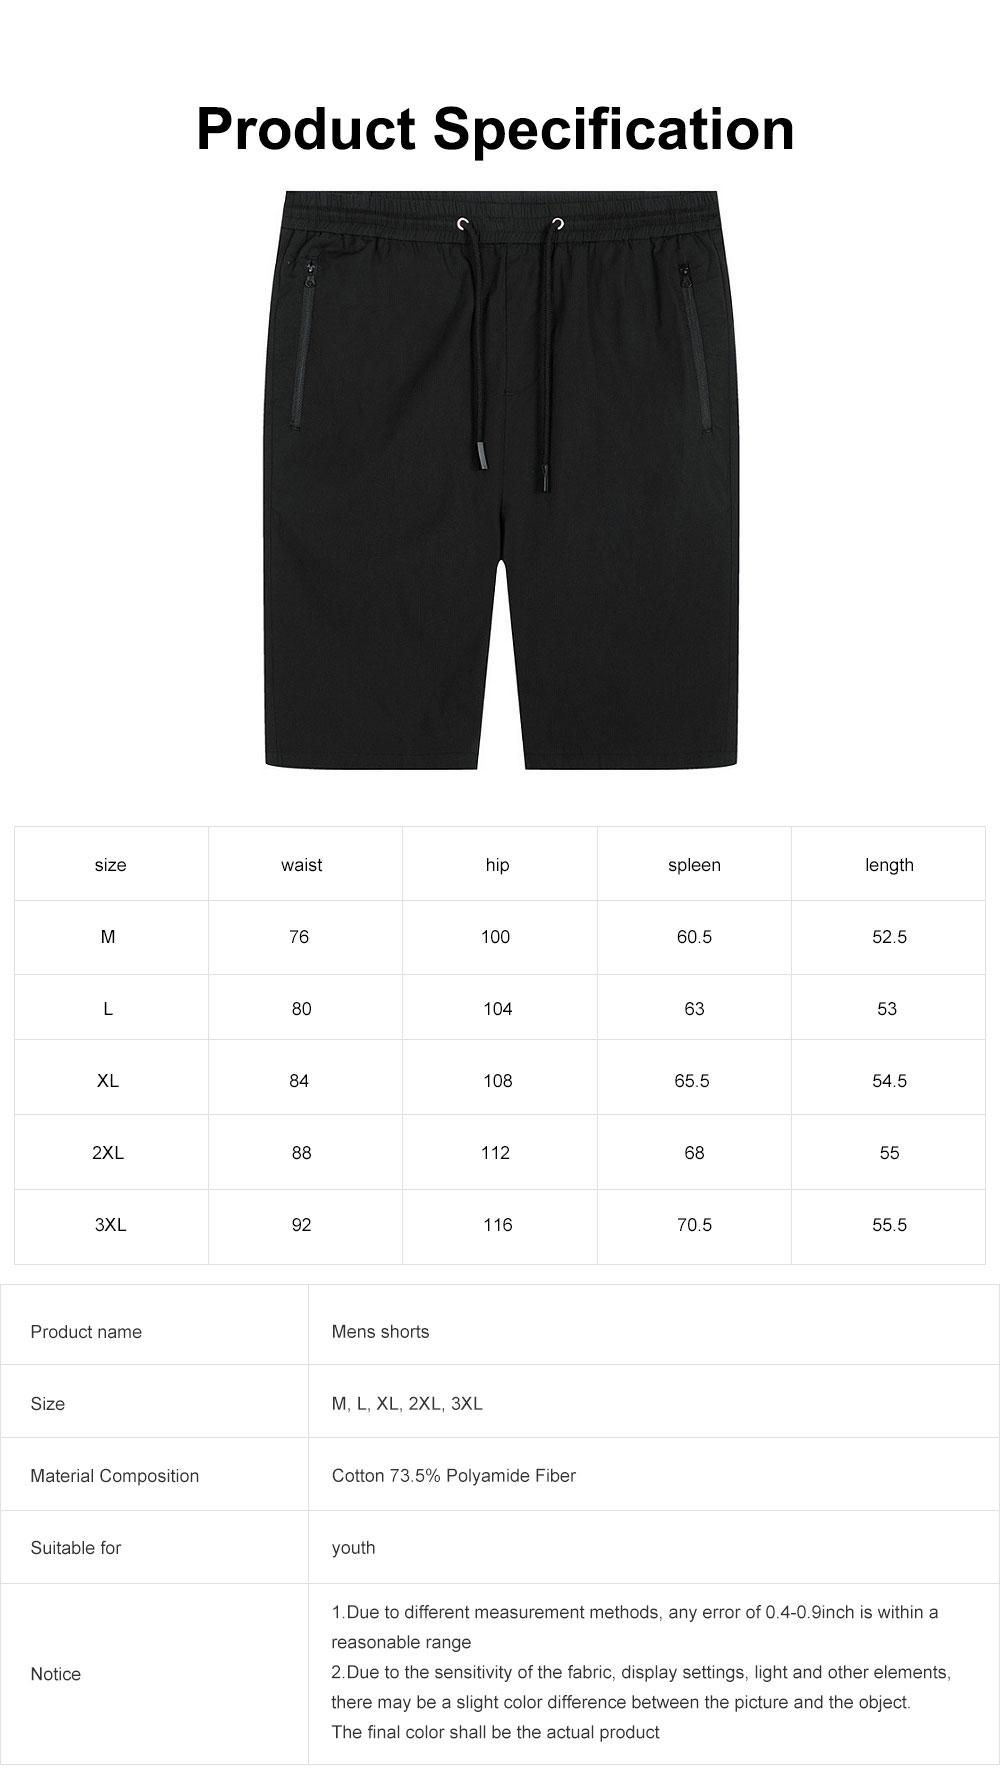 Mens Casual Classic Shorts, Fit Hybrid Chino Shorts, Drawstring Summer Beach Pants with 2 Pockets 6